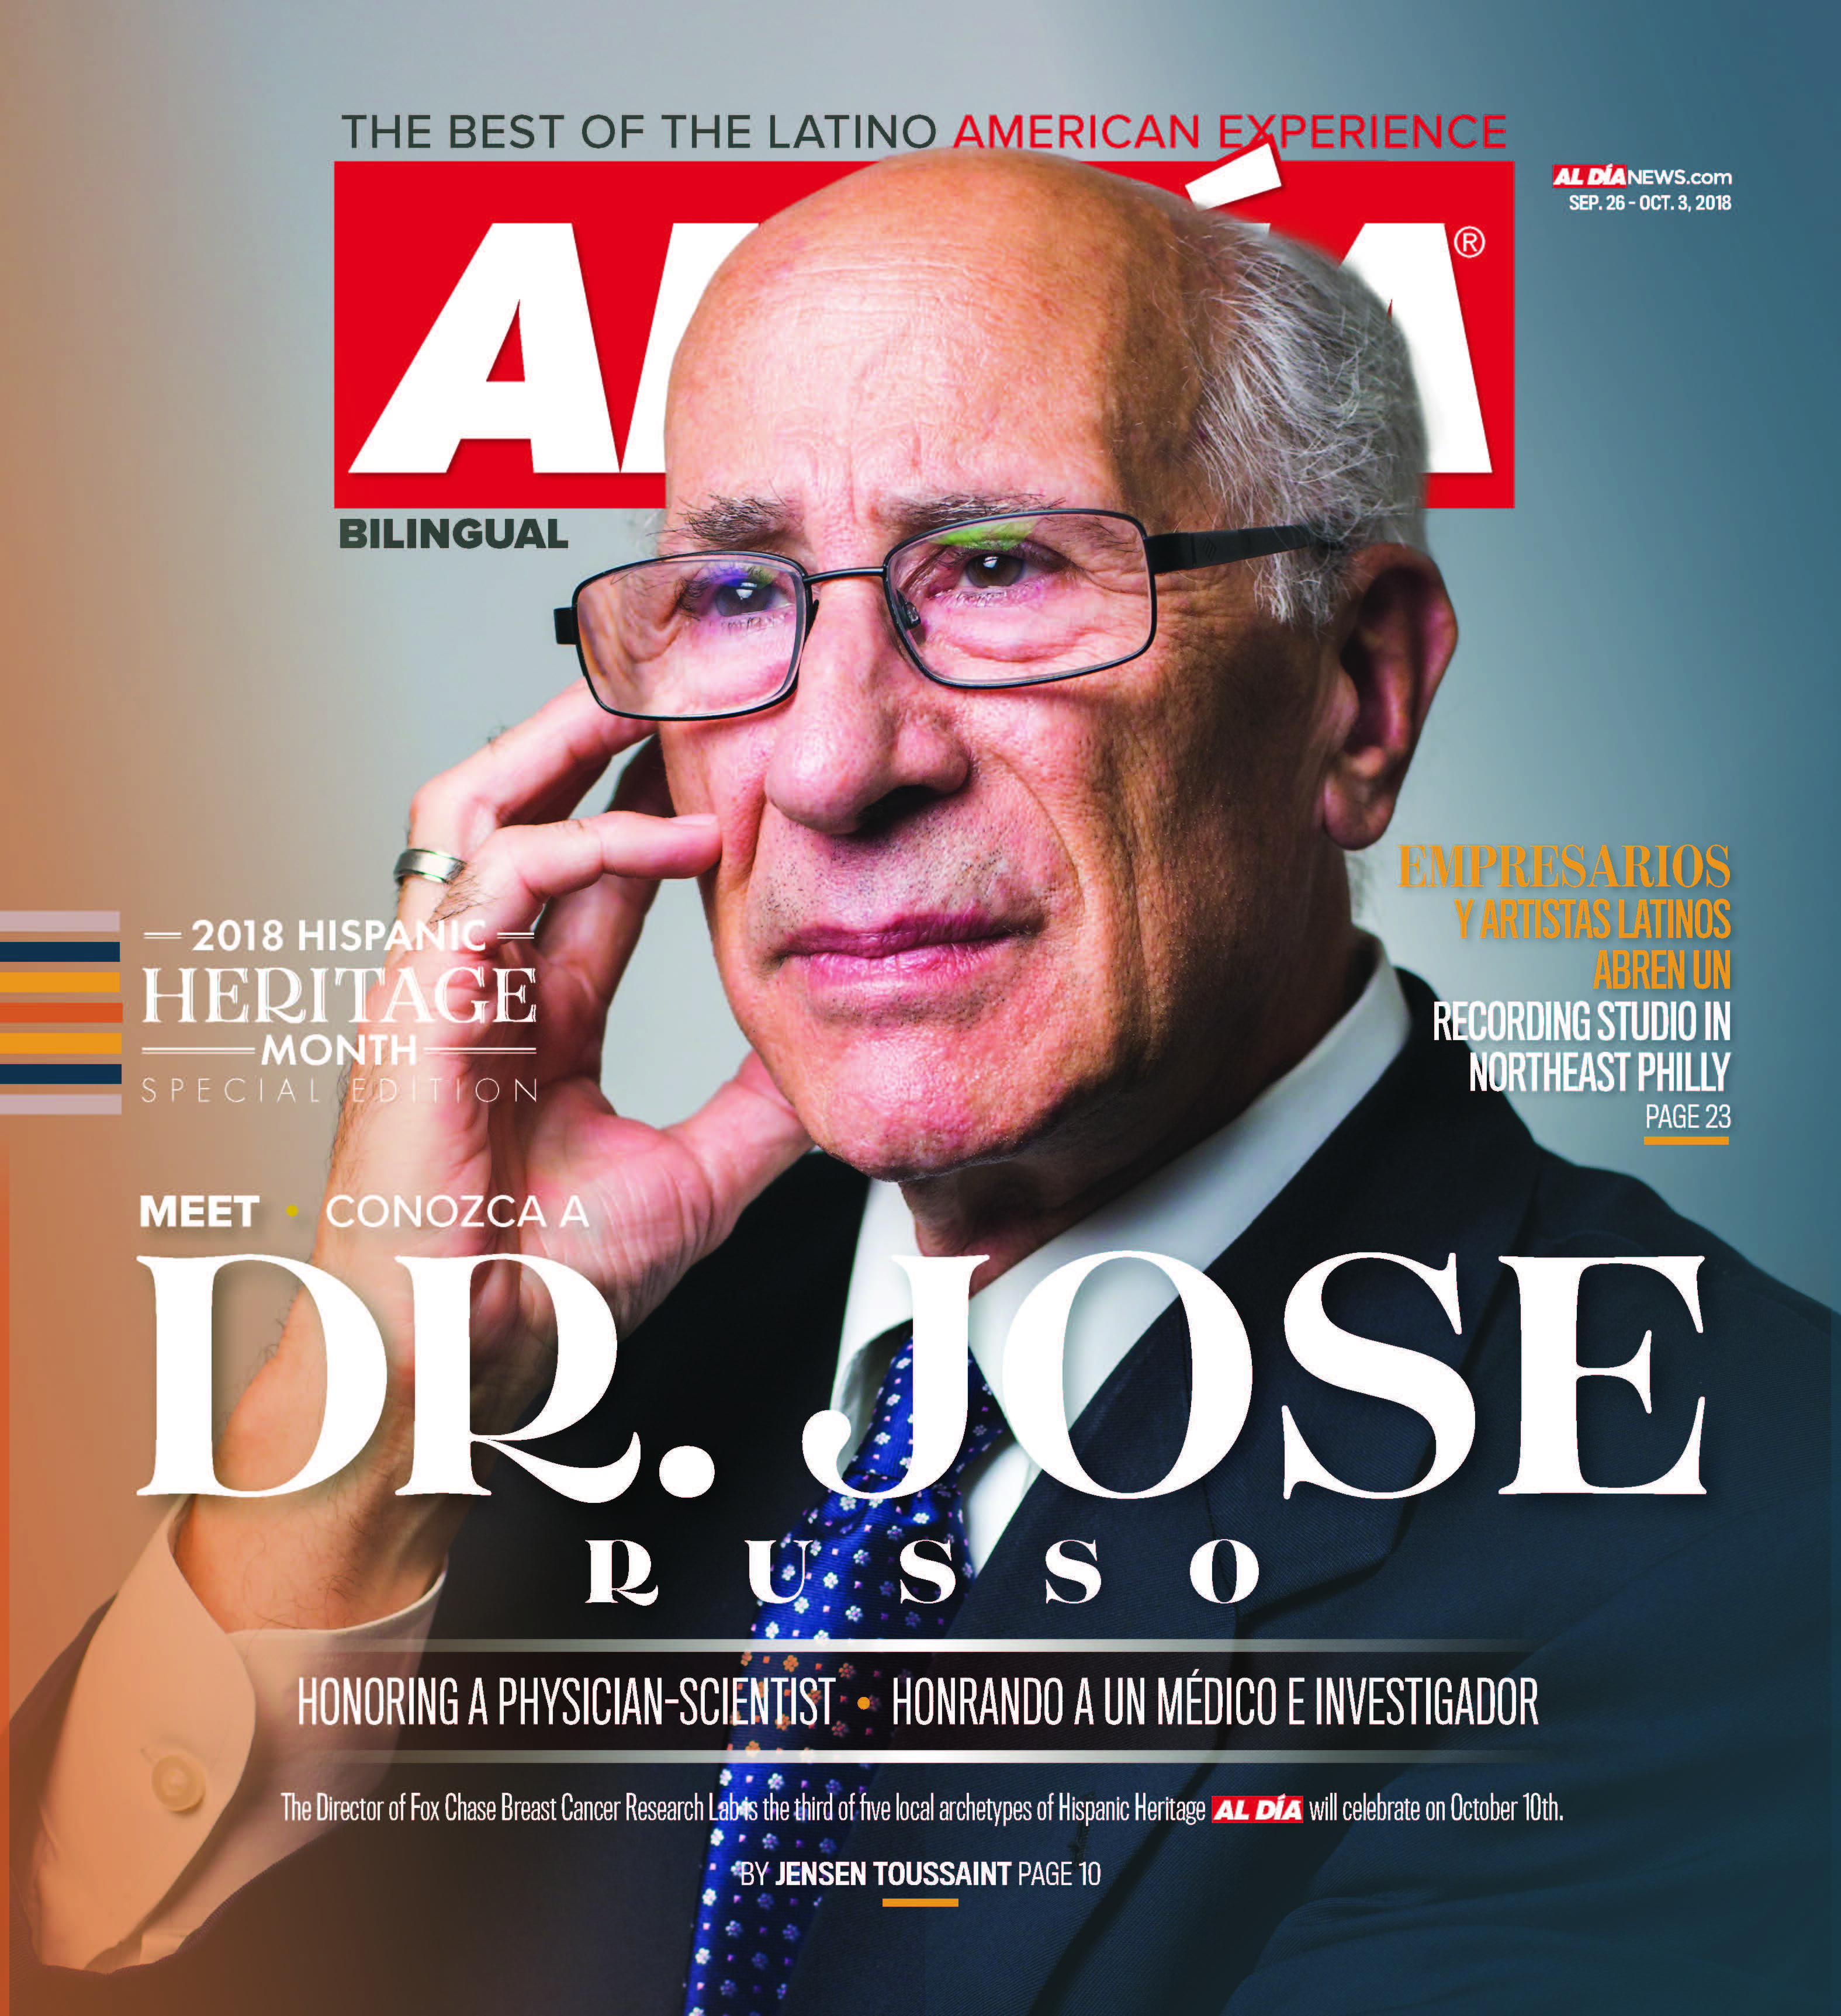 AL DIA News Print Edition September 26 - Oct 03, 2018